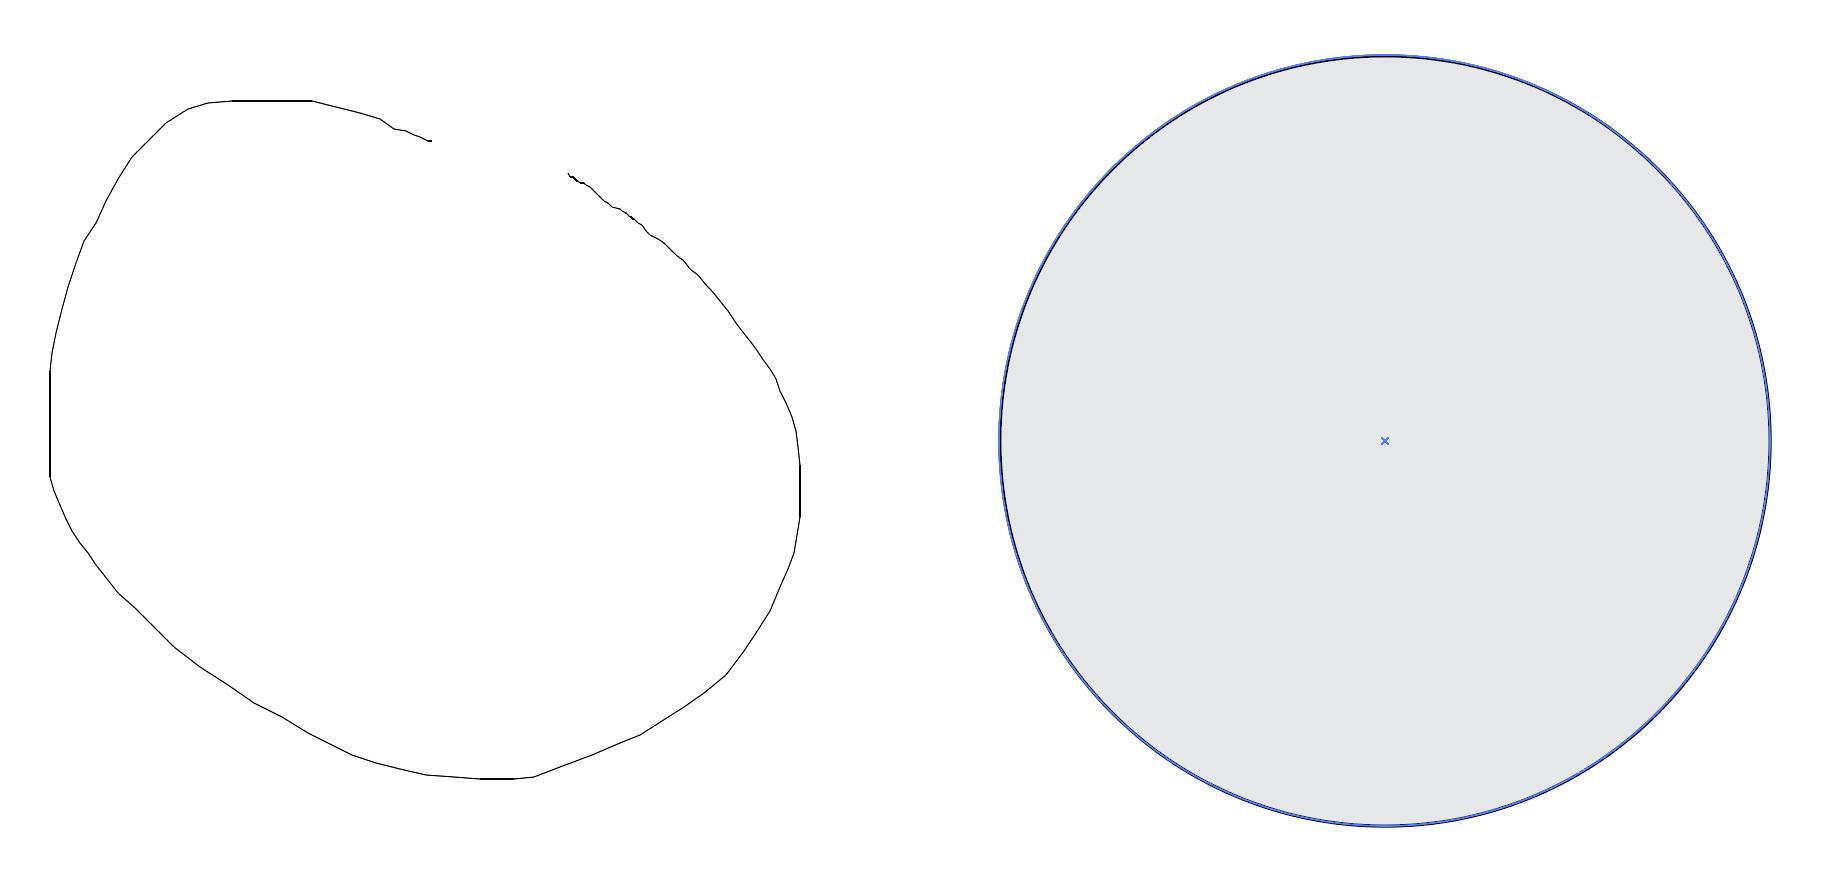 The Shaper tool: New in Illustrator 2015